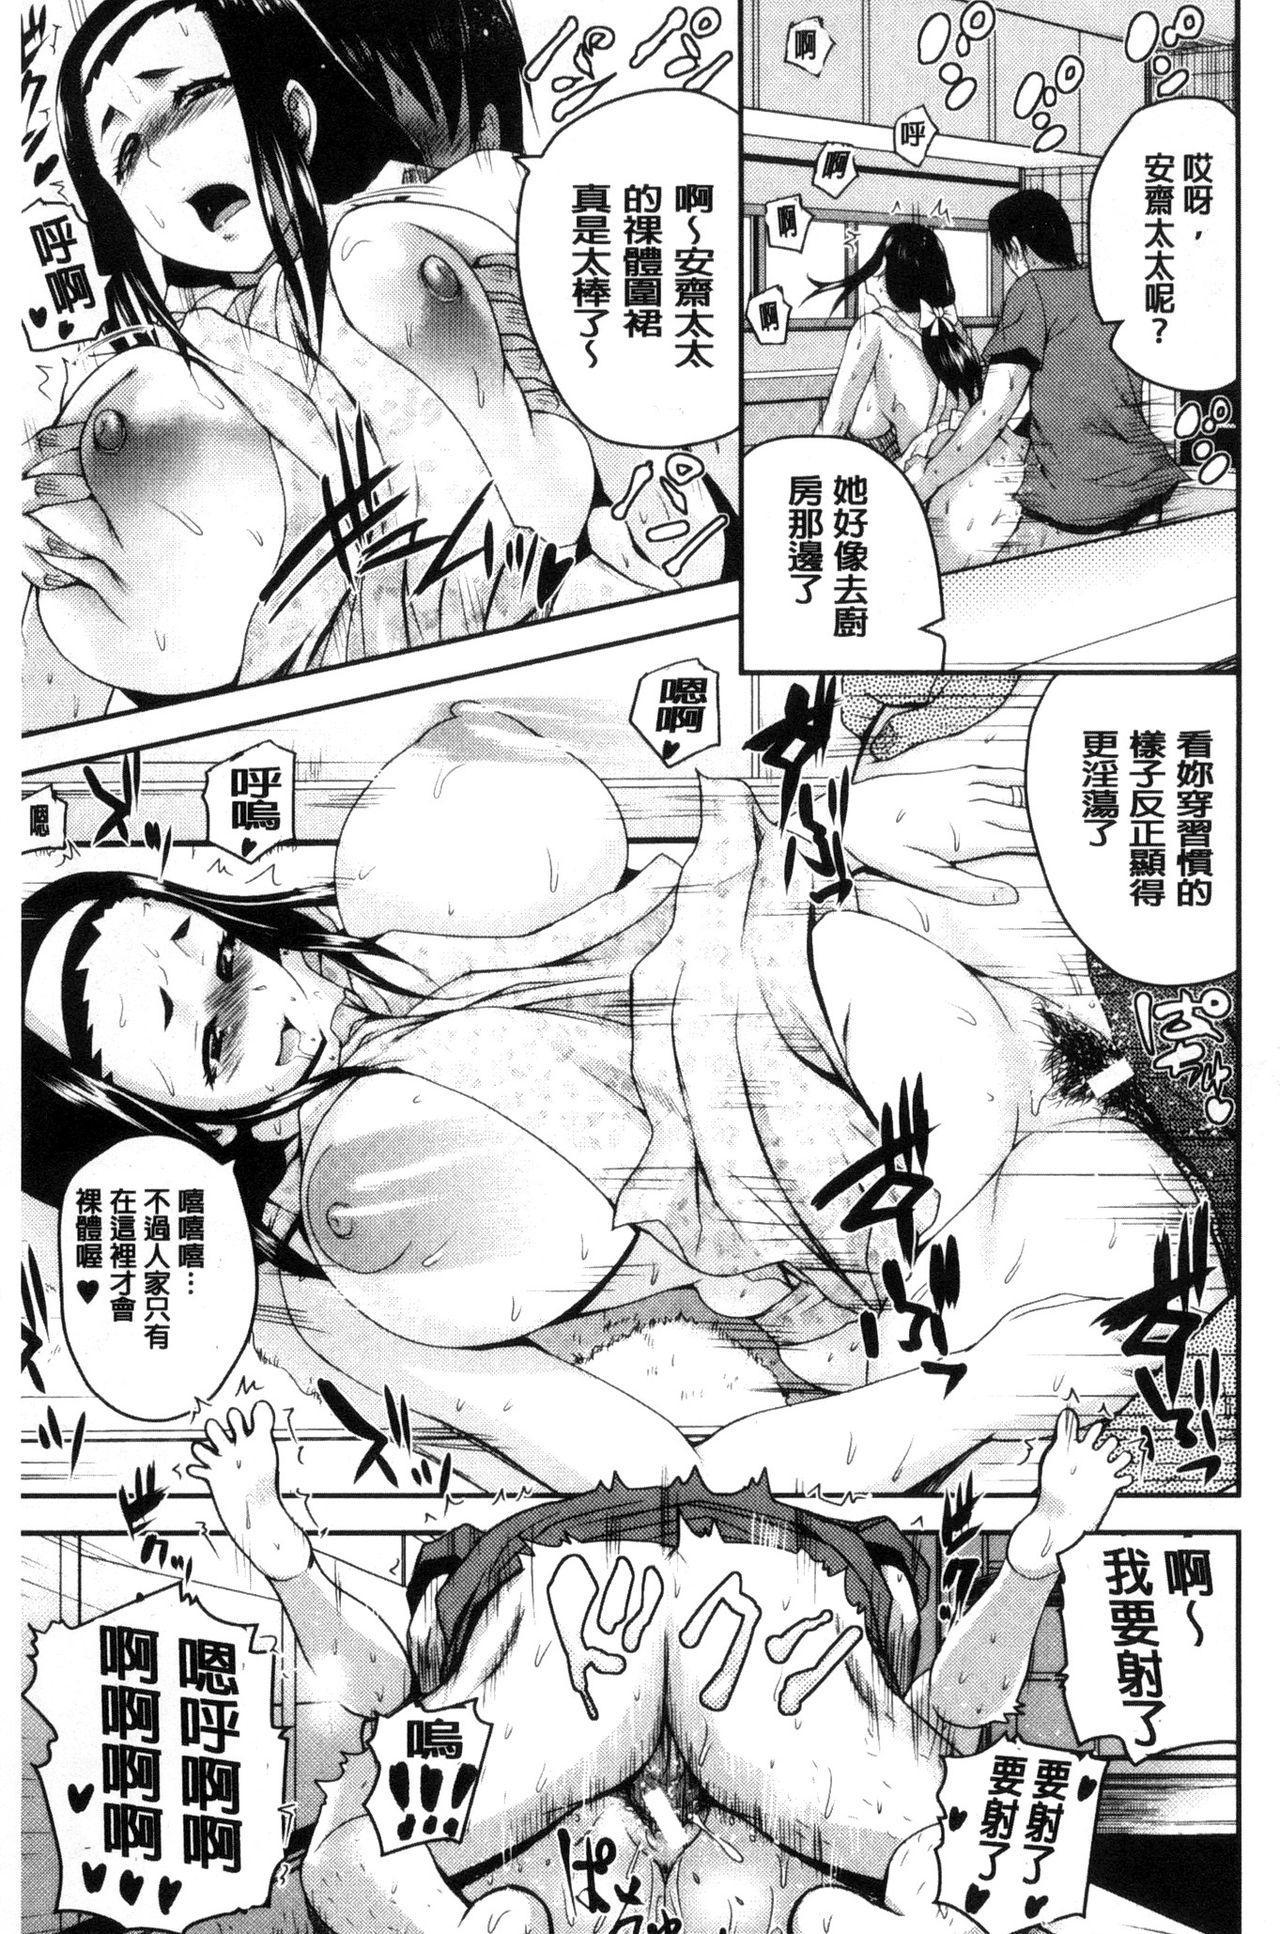 Opink Health Seibo no Fukuin 163